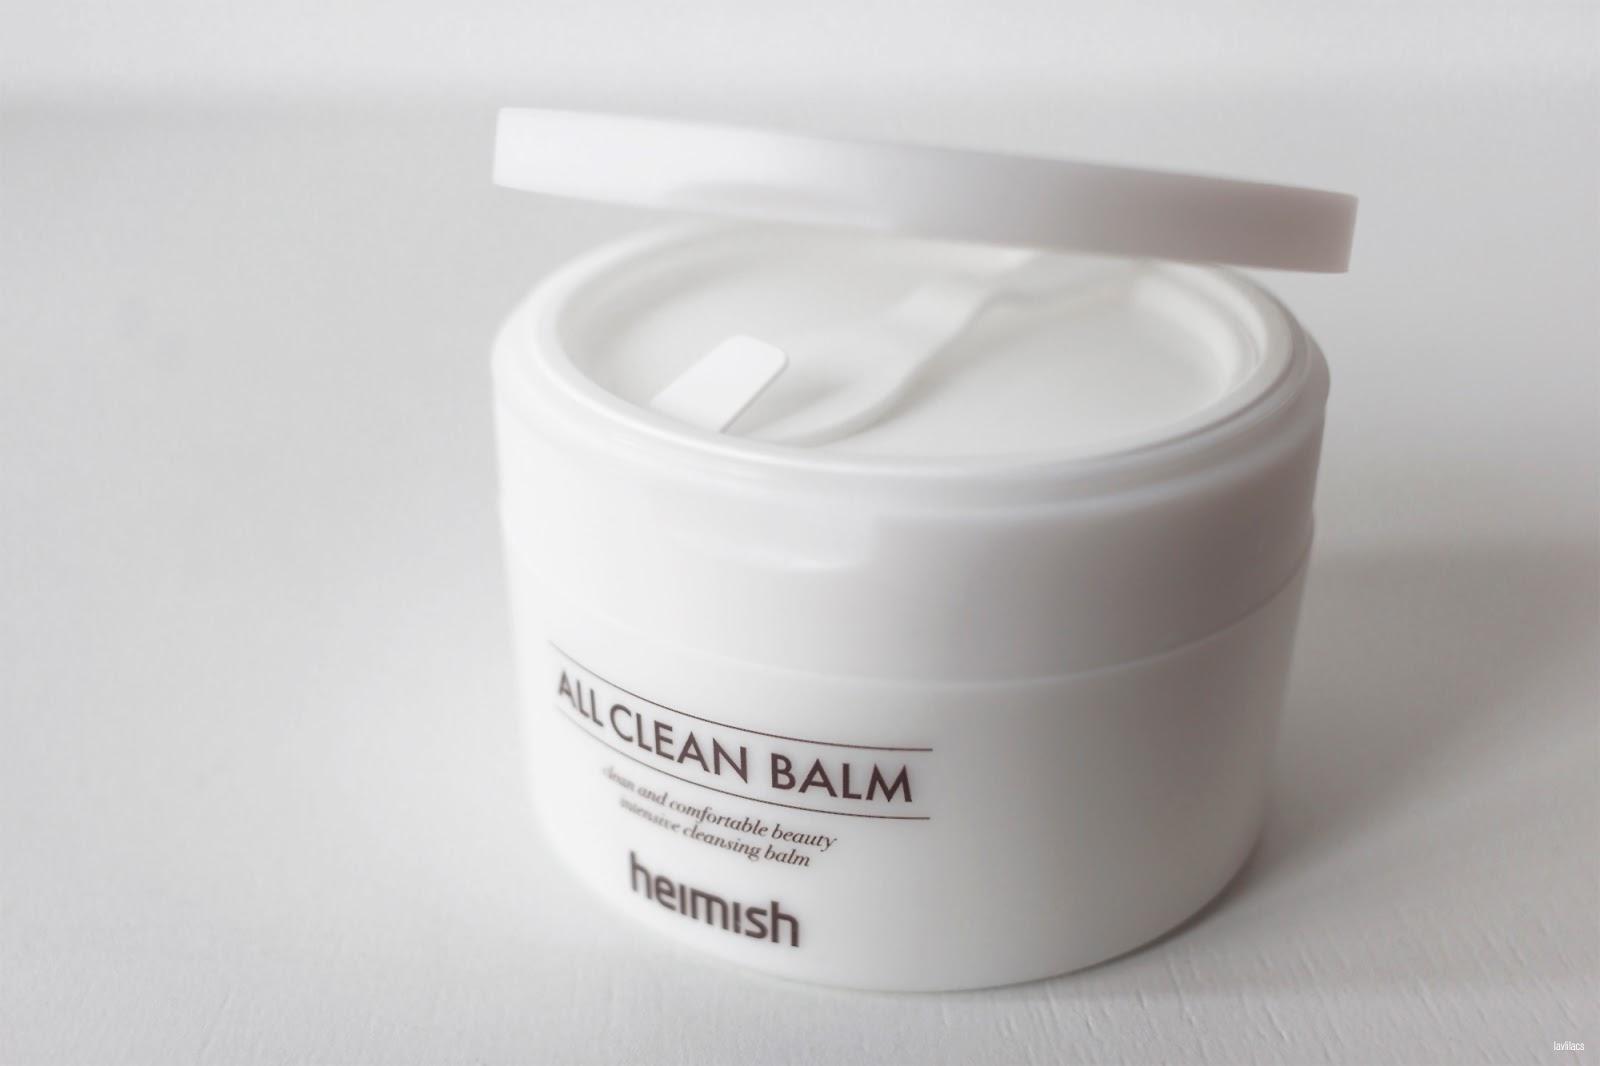 lavlilacs heimish All Clean Balm new lid closeup